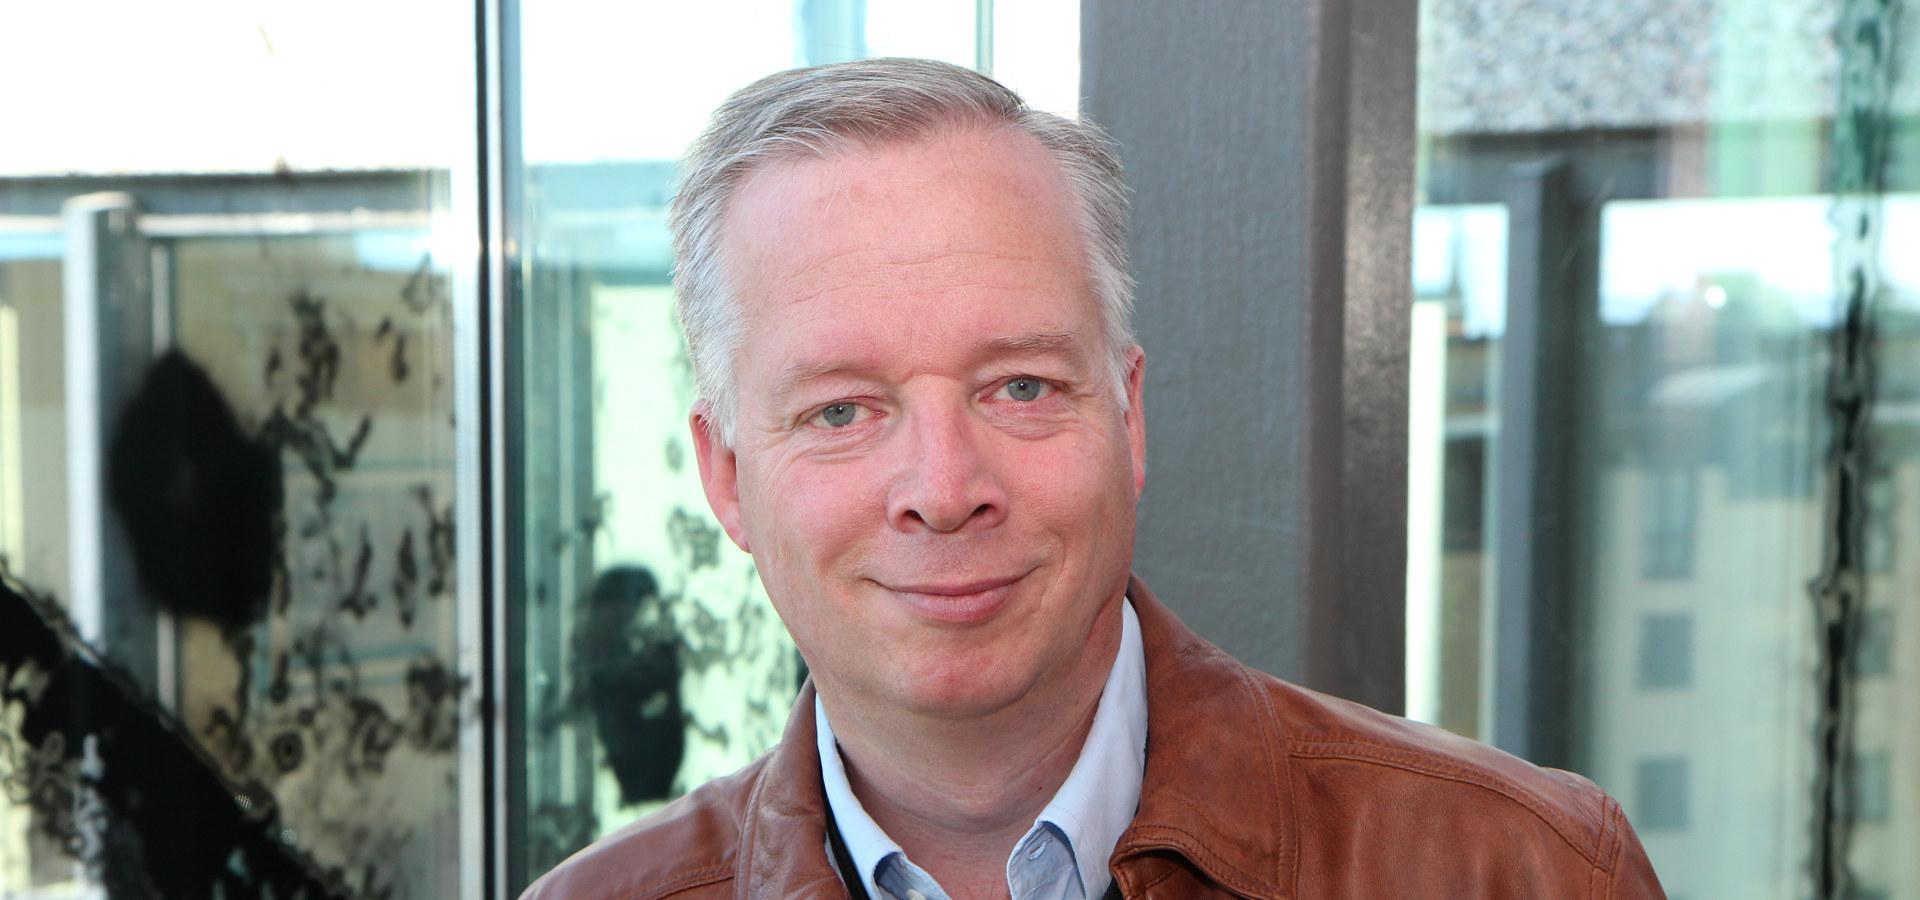 Bransjesjef Egil Sundet, Norsk Industri Designindustrien